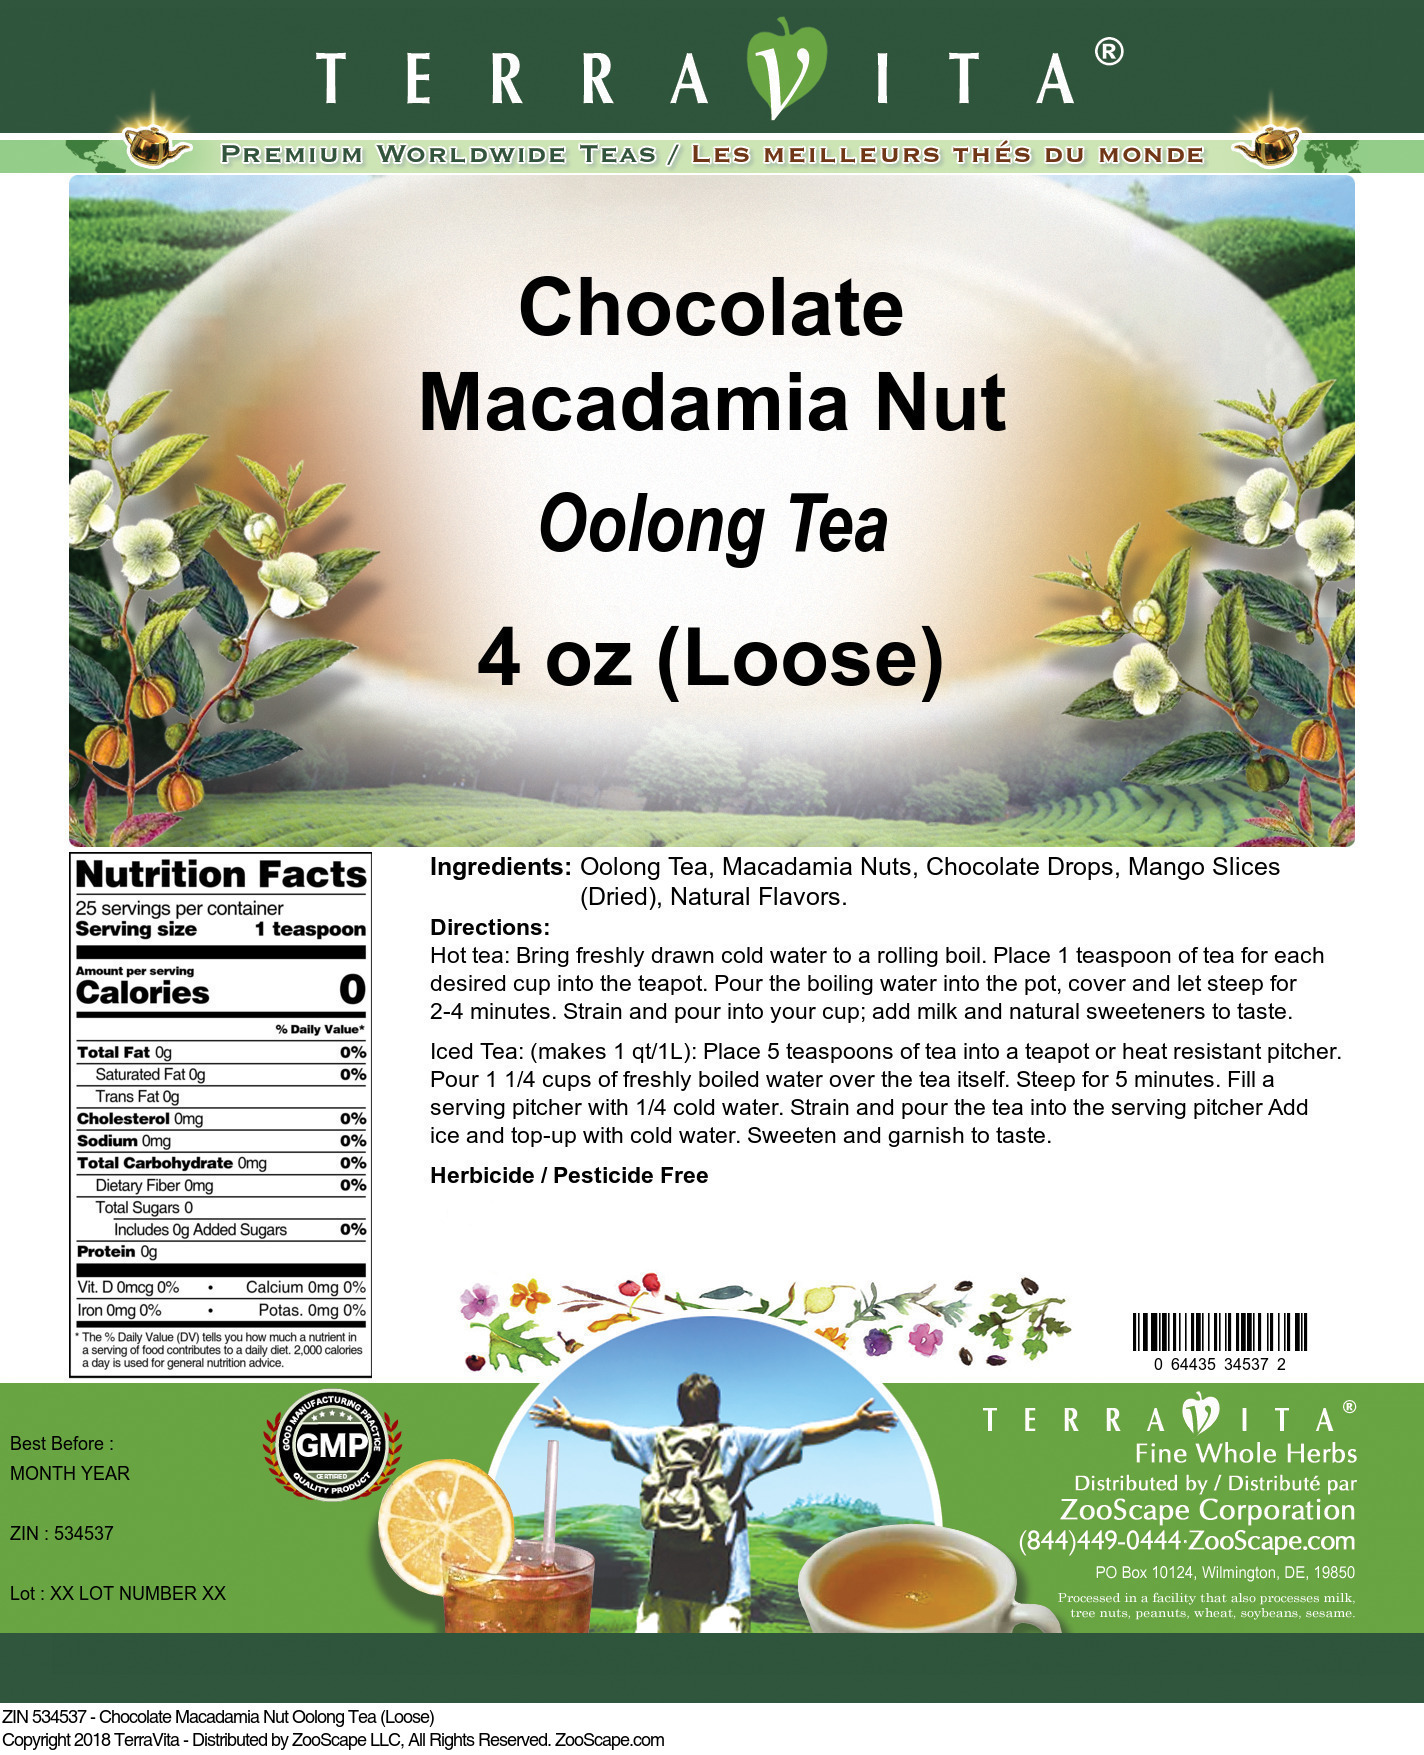 Chocolate Macadamia Nut Oolong Tea